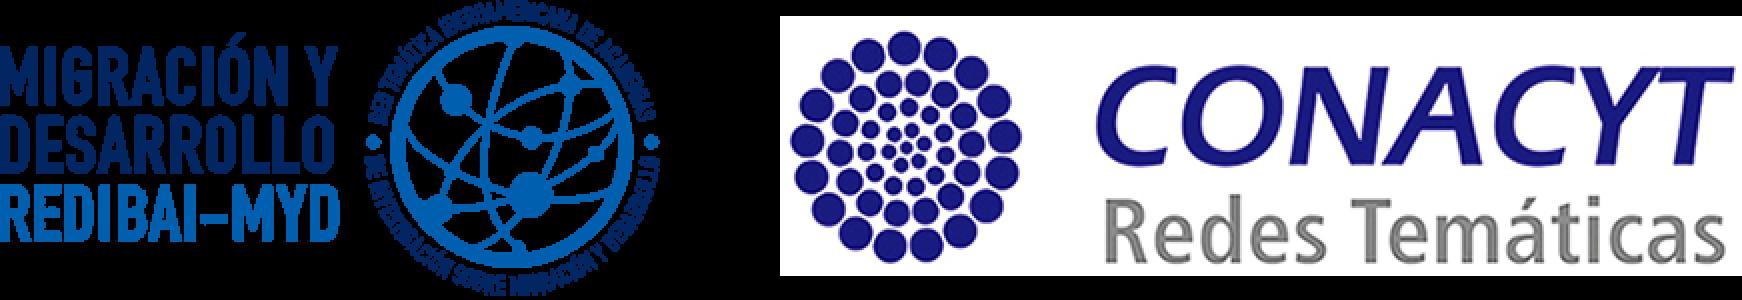 IBAI-MYD